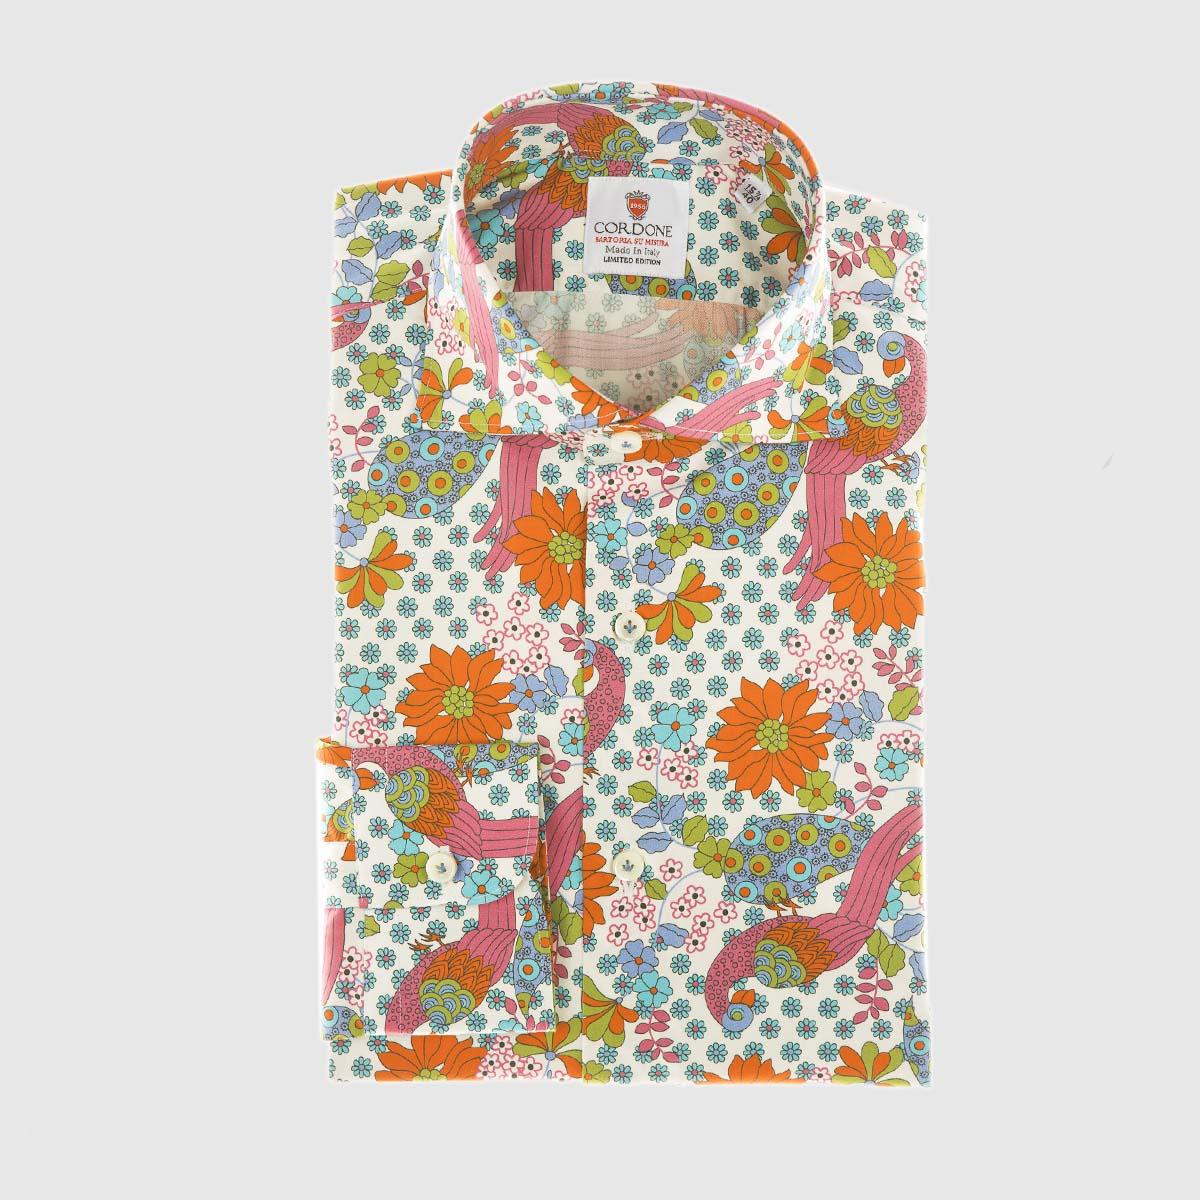 Camicia elegante di Mykonos